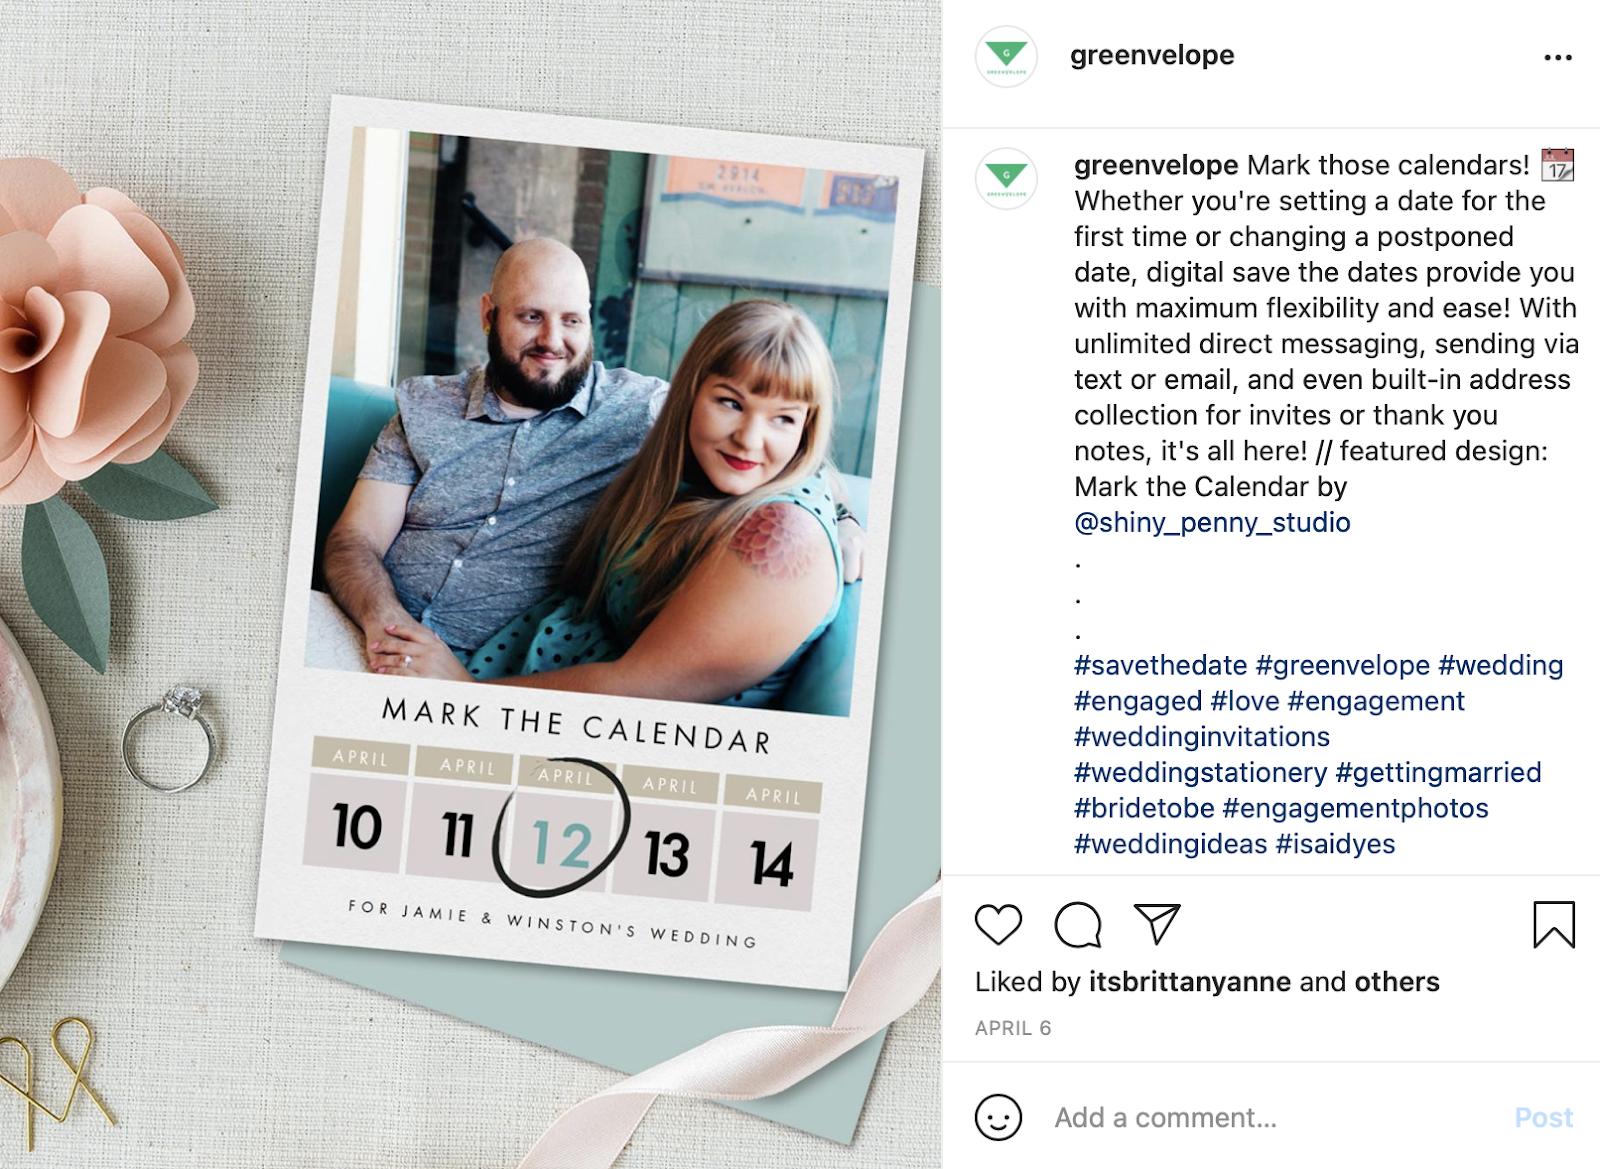 greenvelope for online wedding invitations